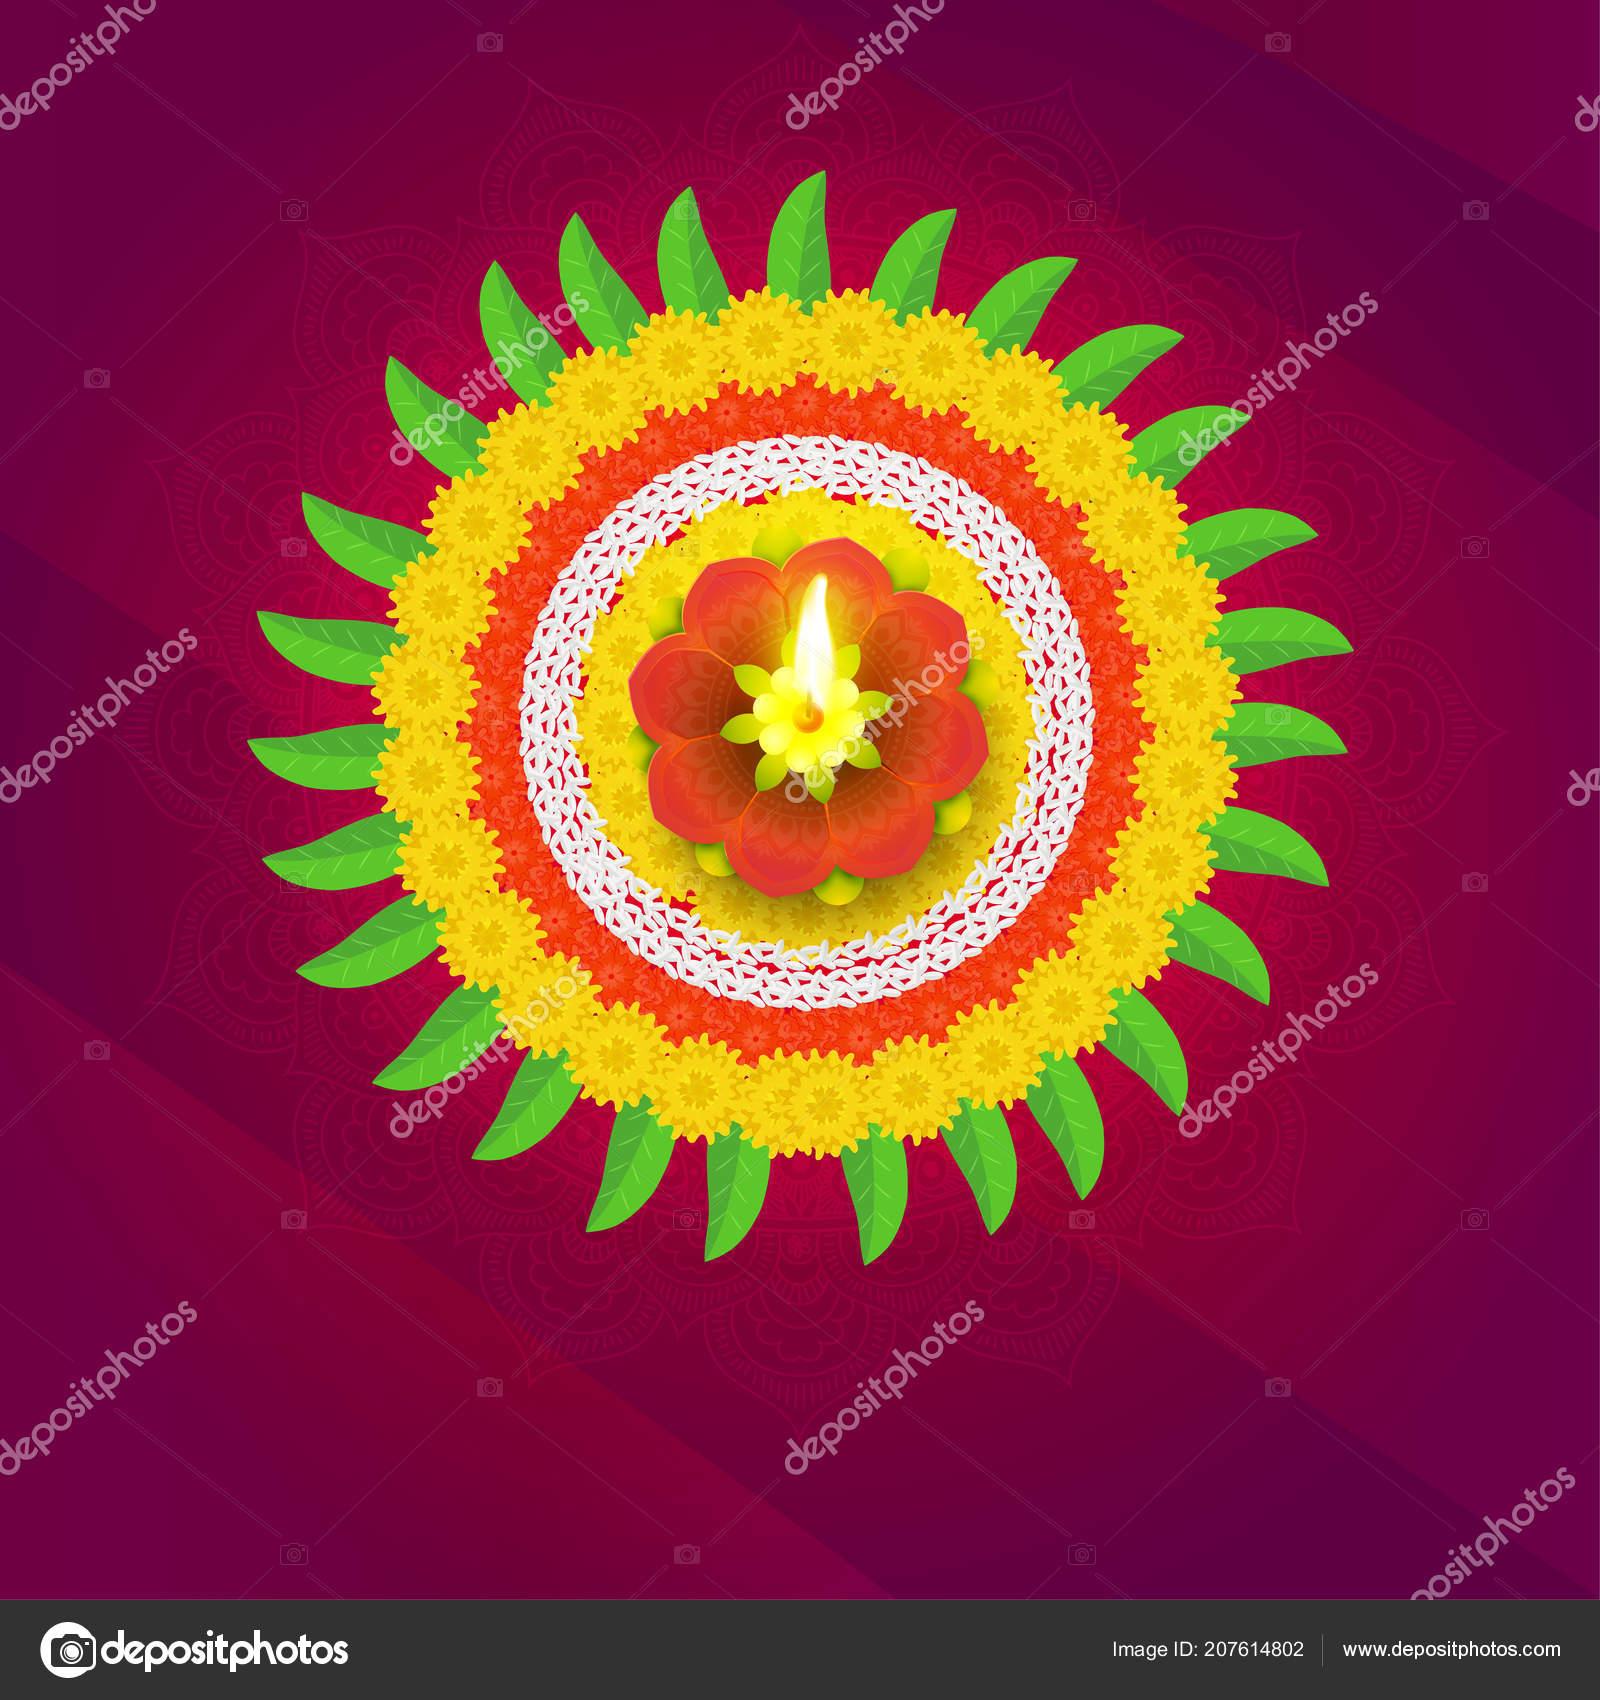 Beautiful Rangoli Design Made Flowers Mango Leaves Illuminated